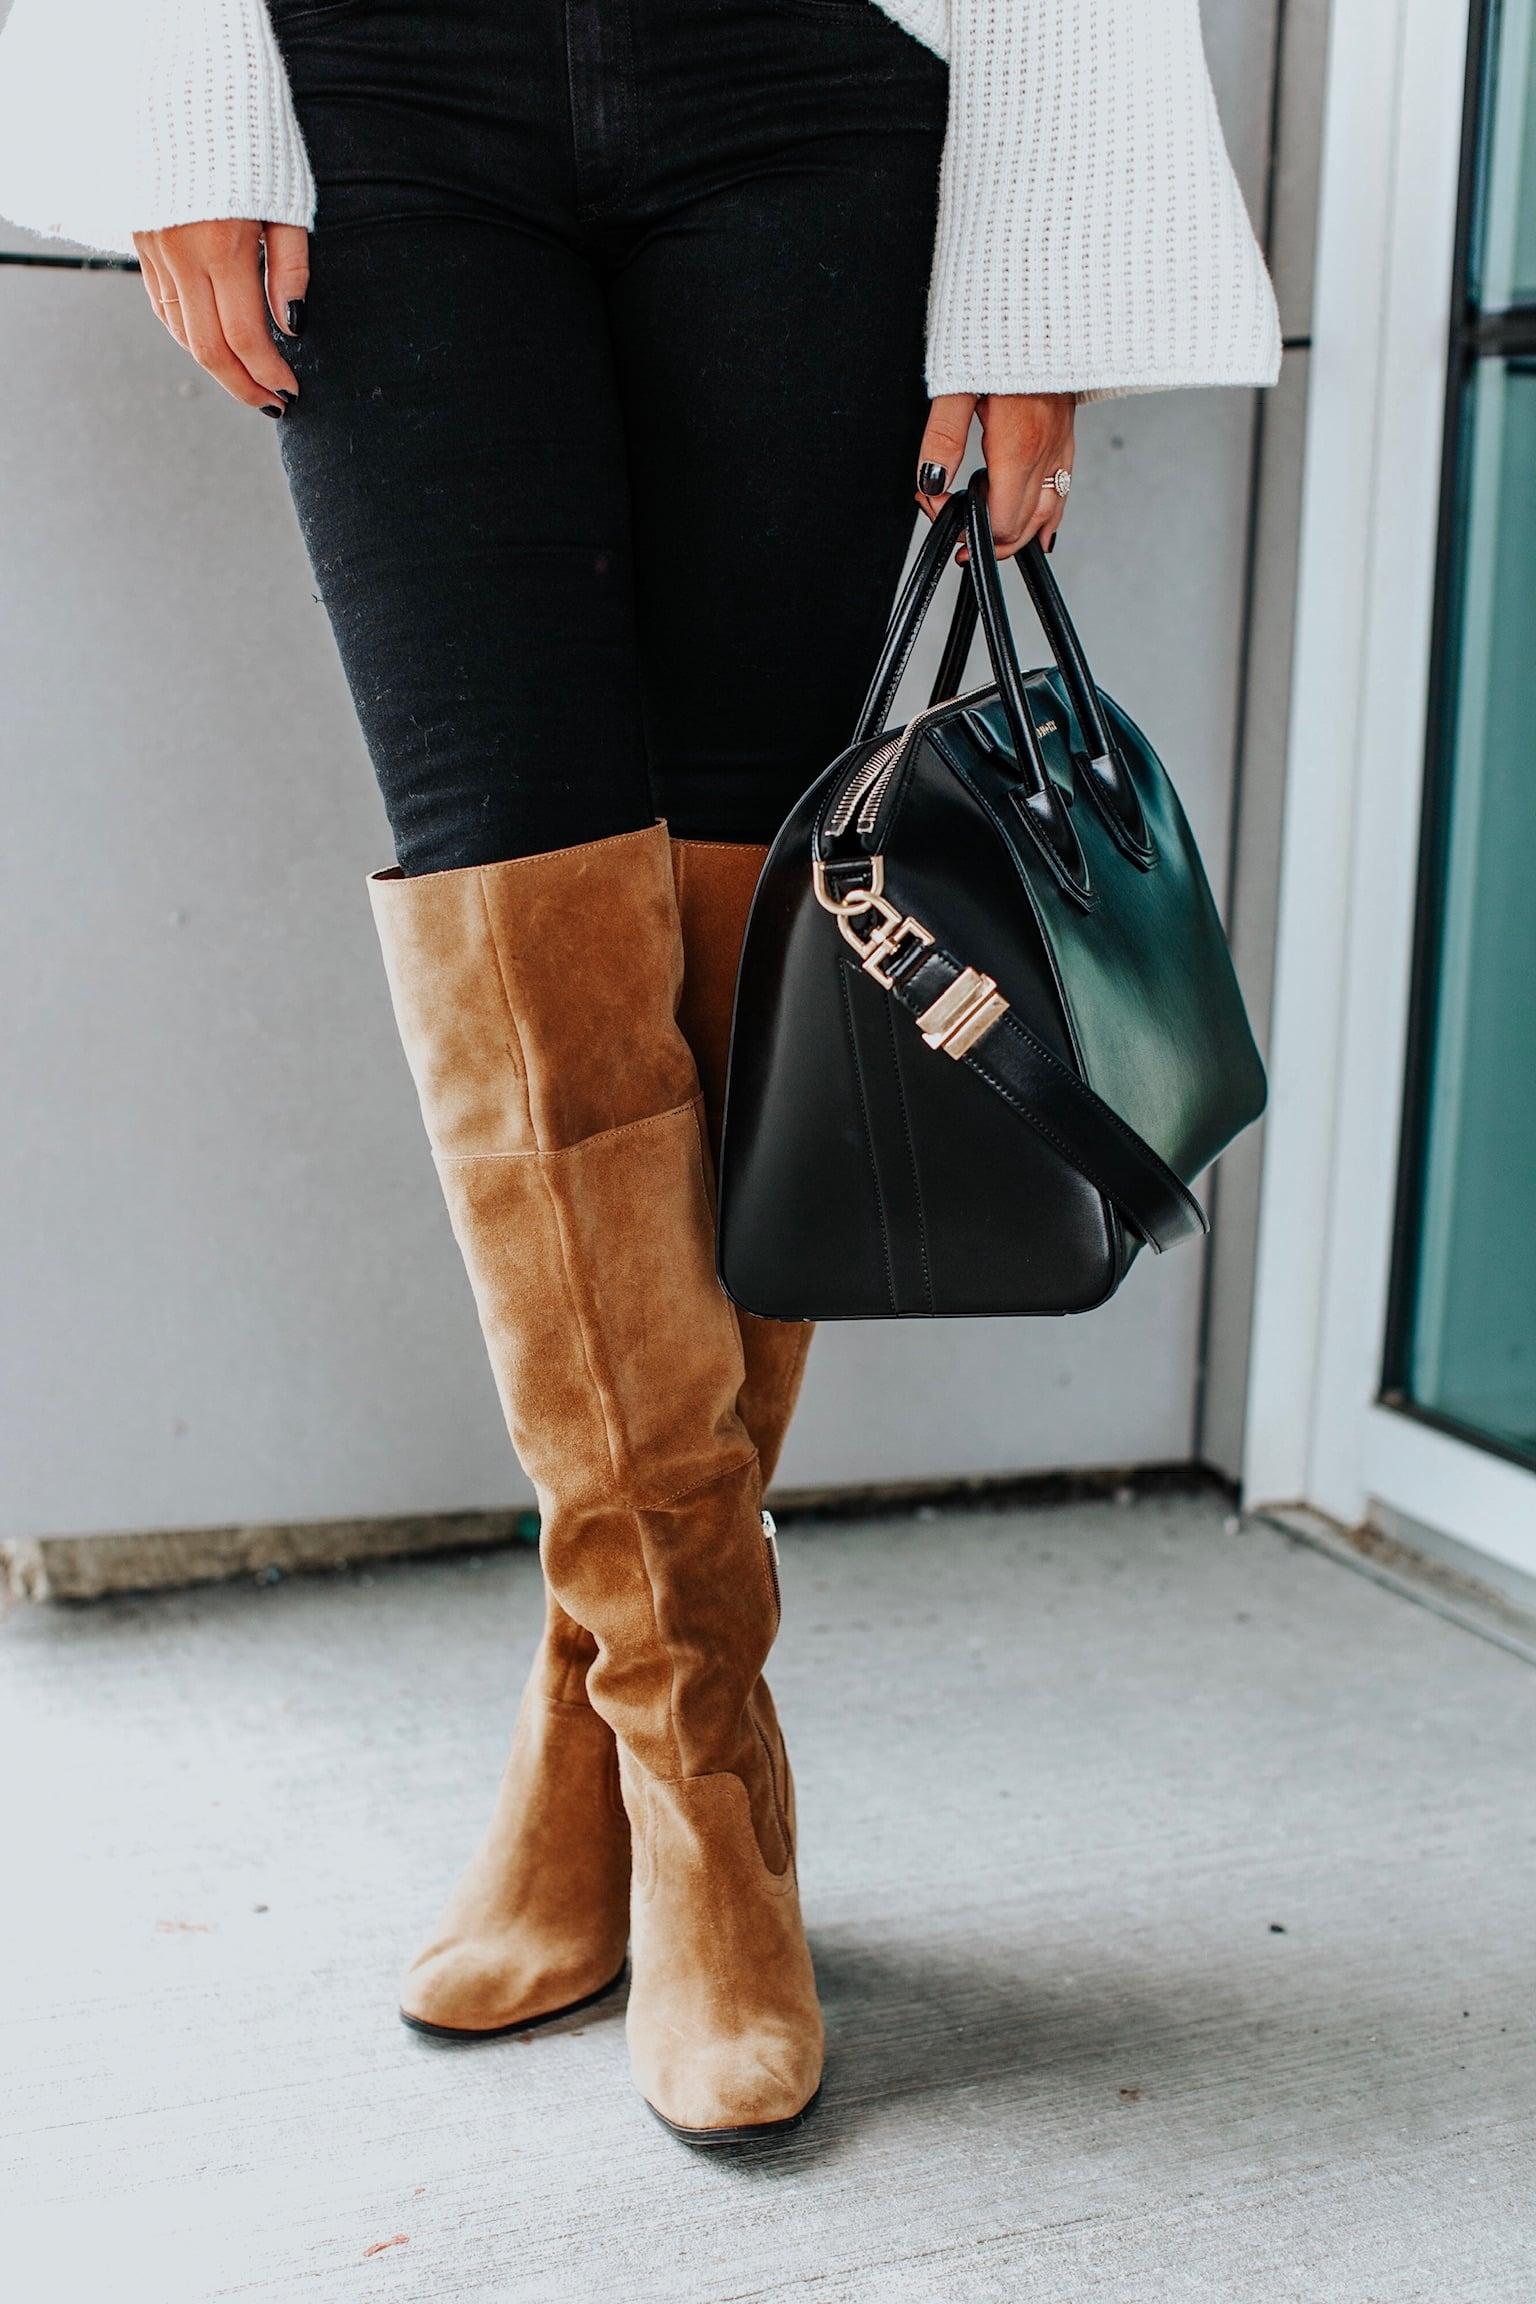 1 person, tan over the knee boots and givenchy antigona bag